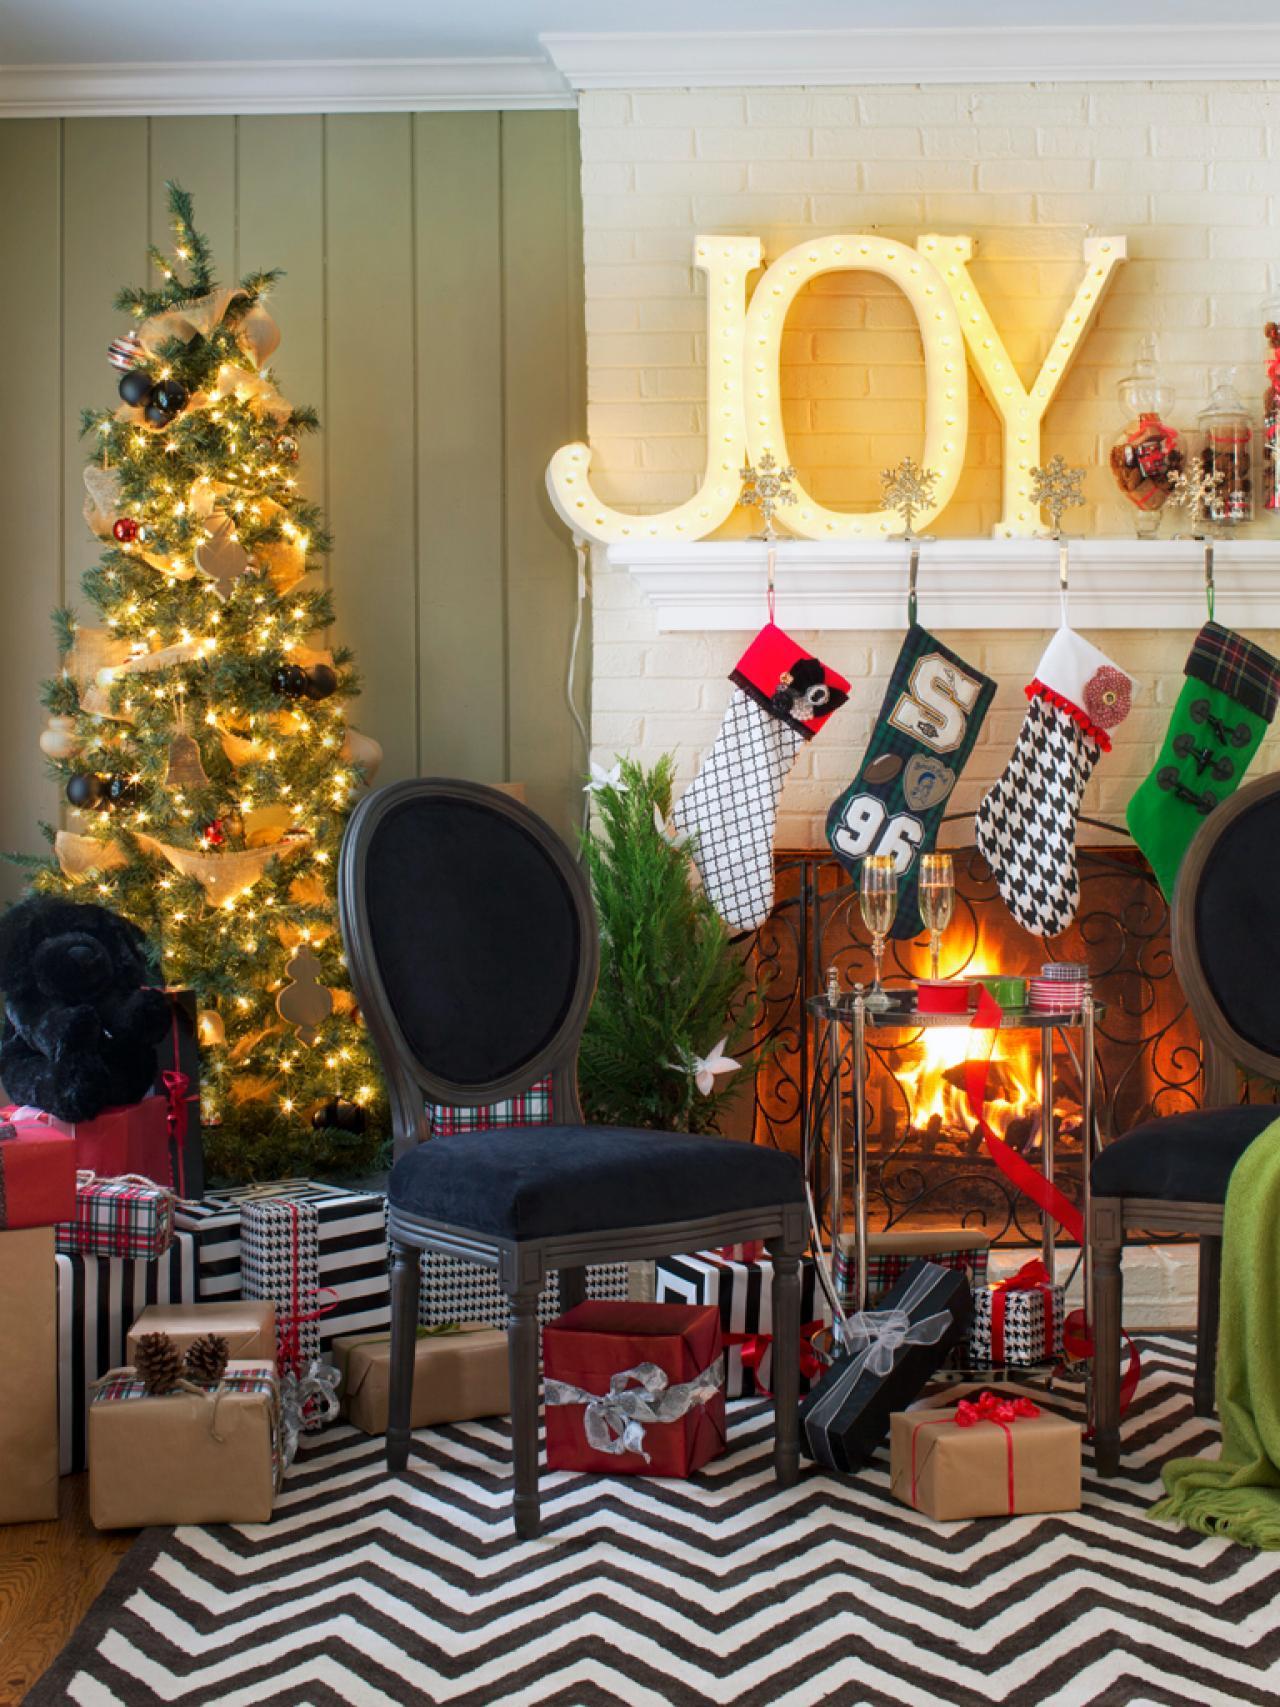 High Quality 5 Interior Designer Approved Holiday Decorating Tips | HGTVu0027s Decorating U0026  Design Blog | HGTV